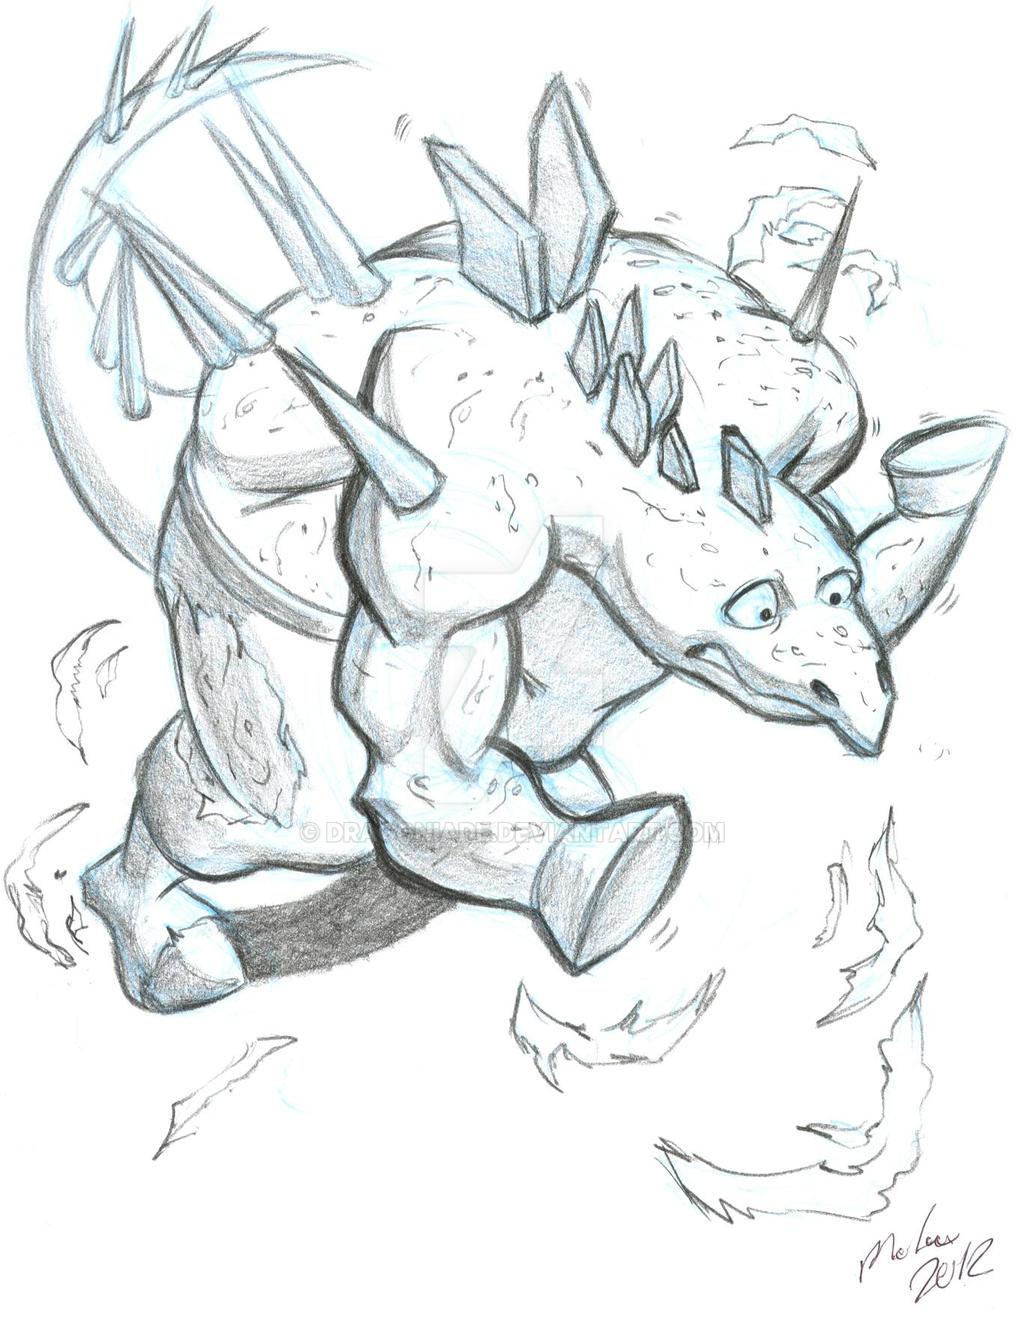 K for Kentrosaurus TF by Dragoniade